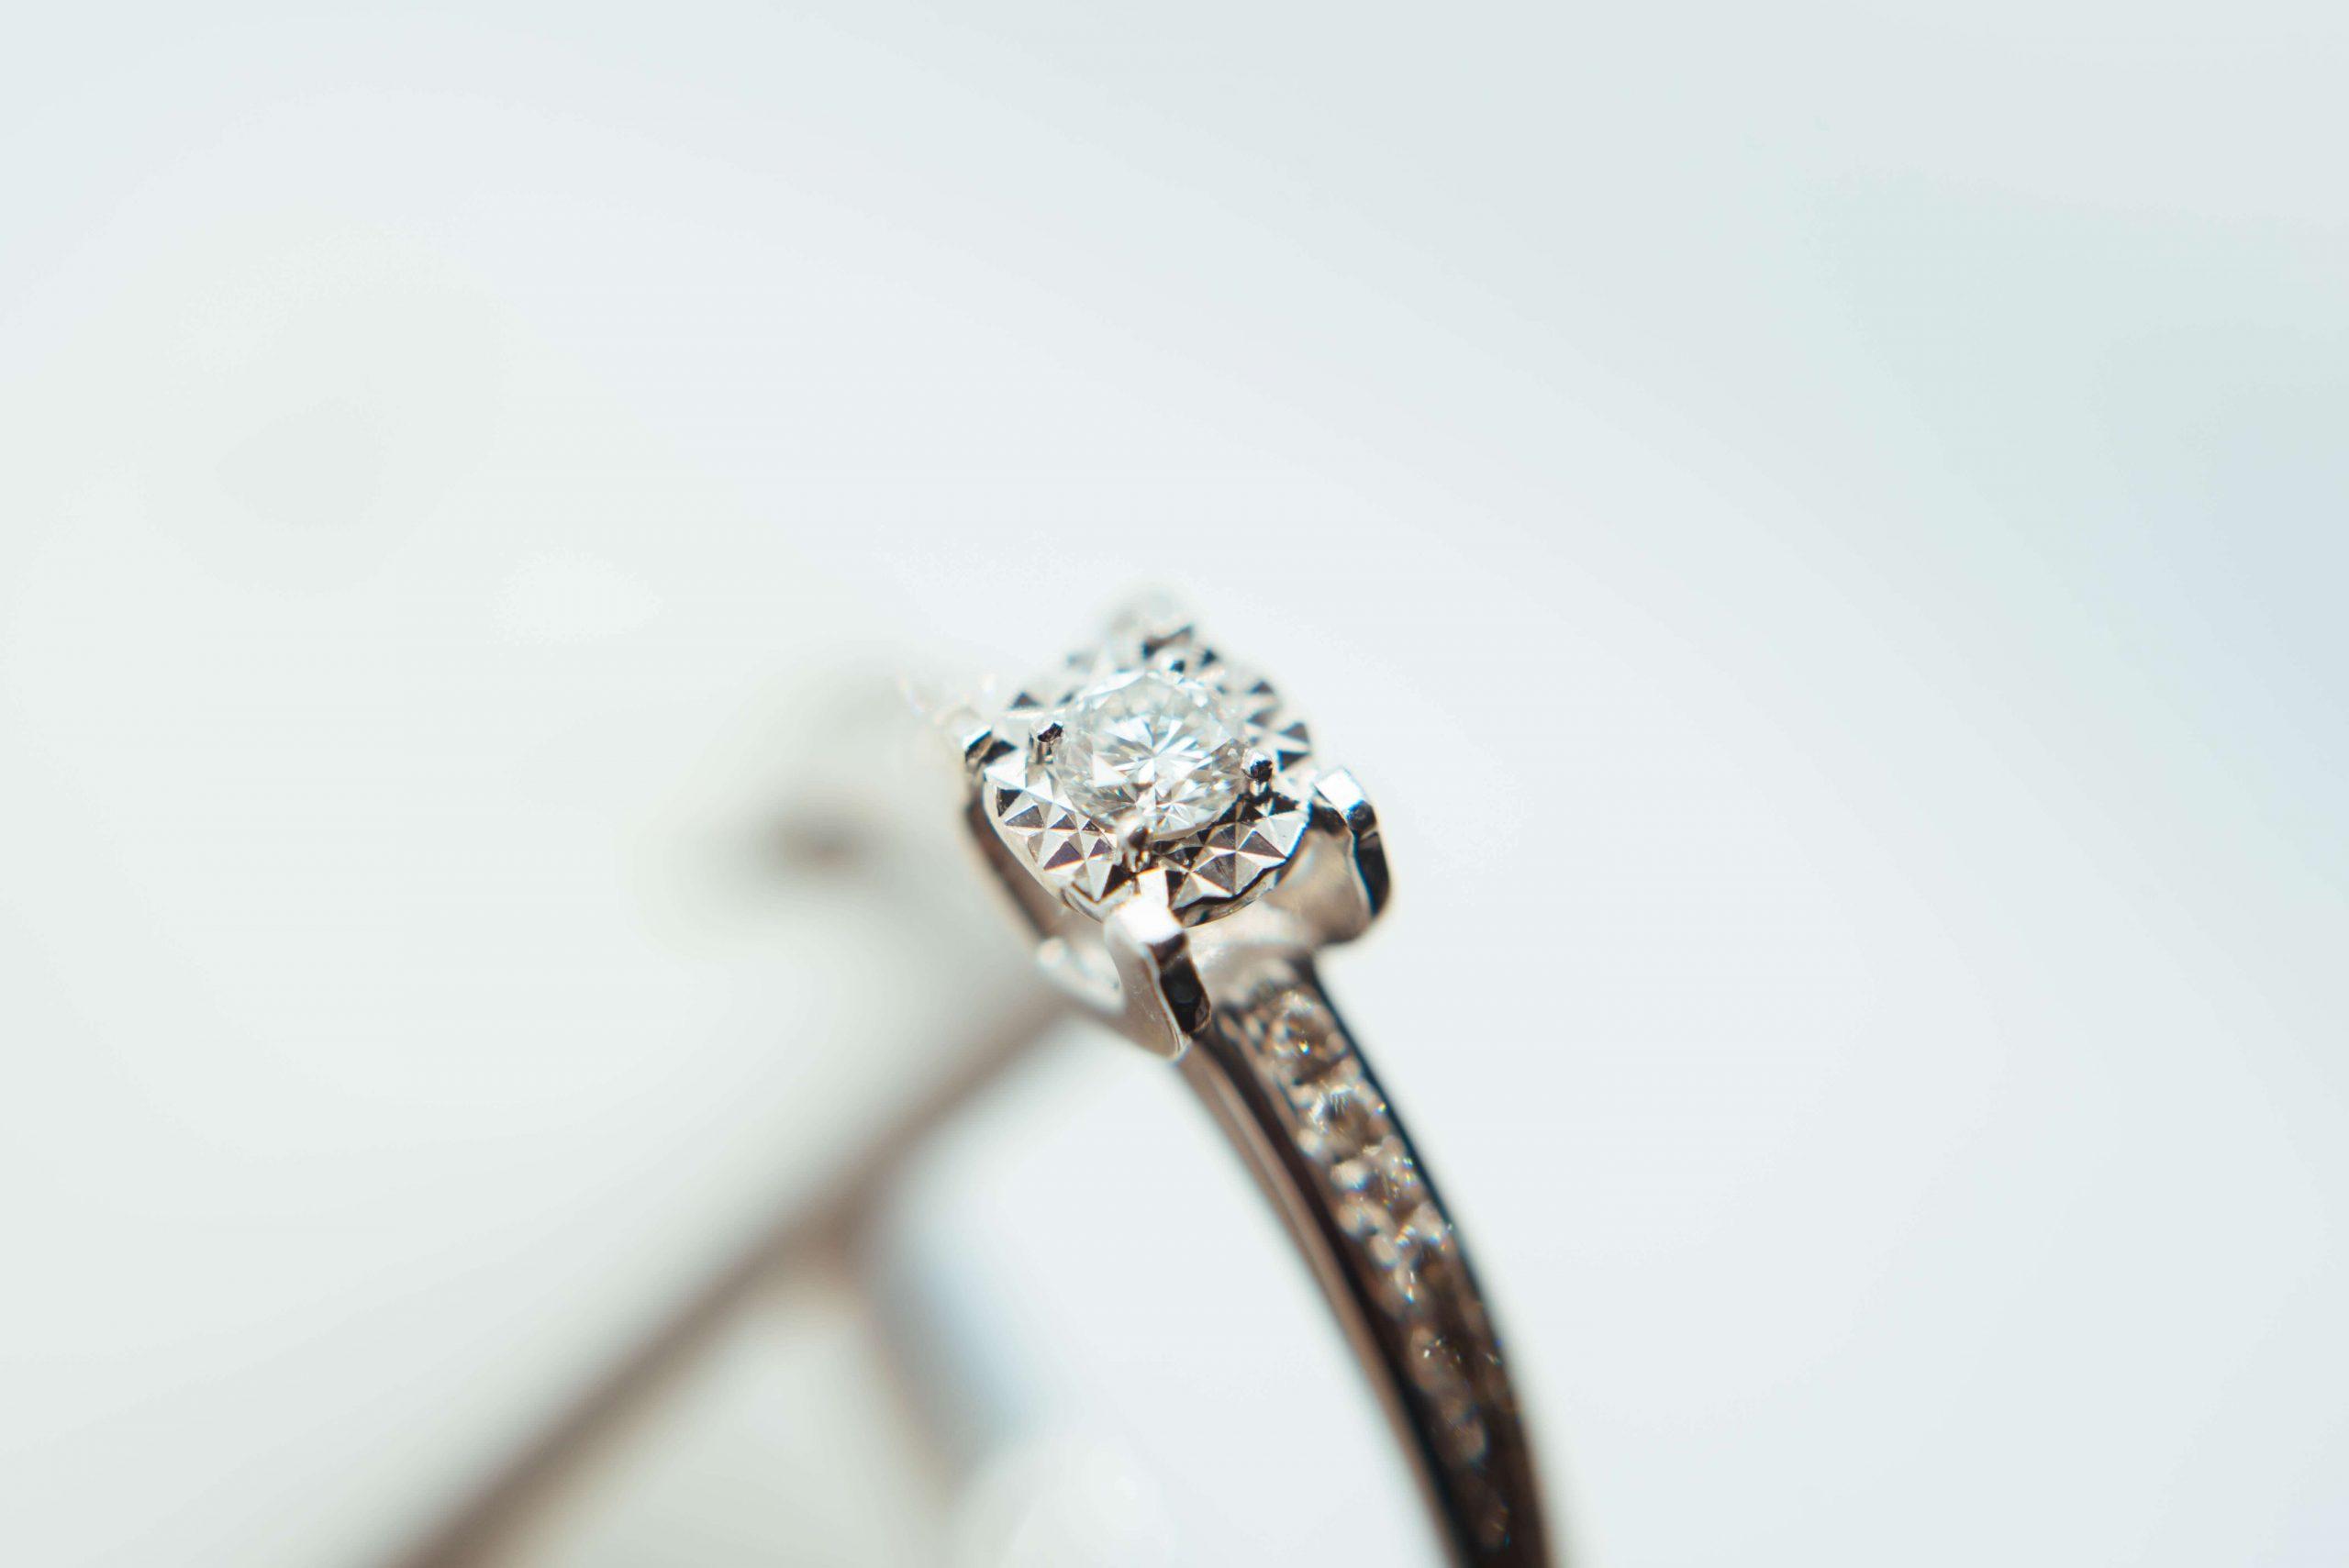 Minimal Luxurious Collection of Diamond Rings